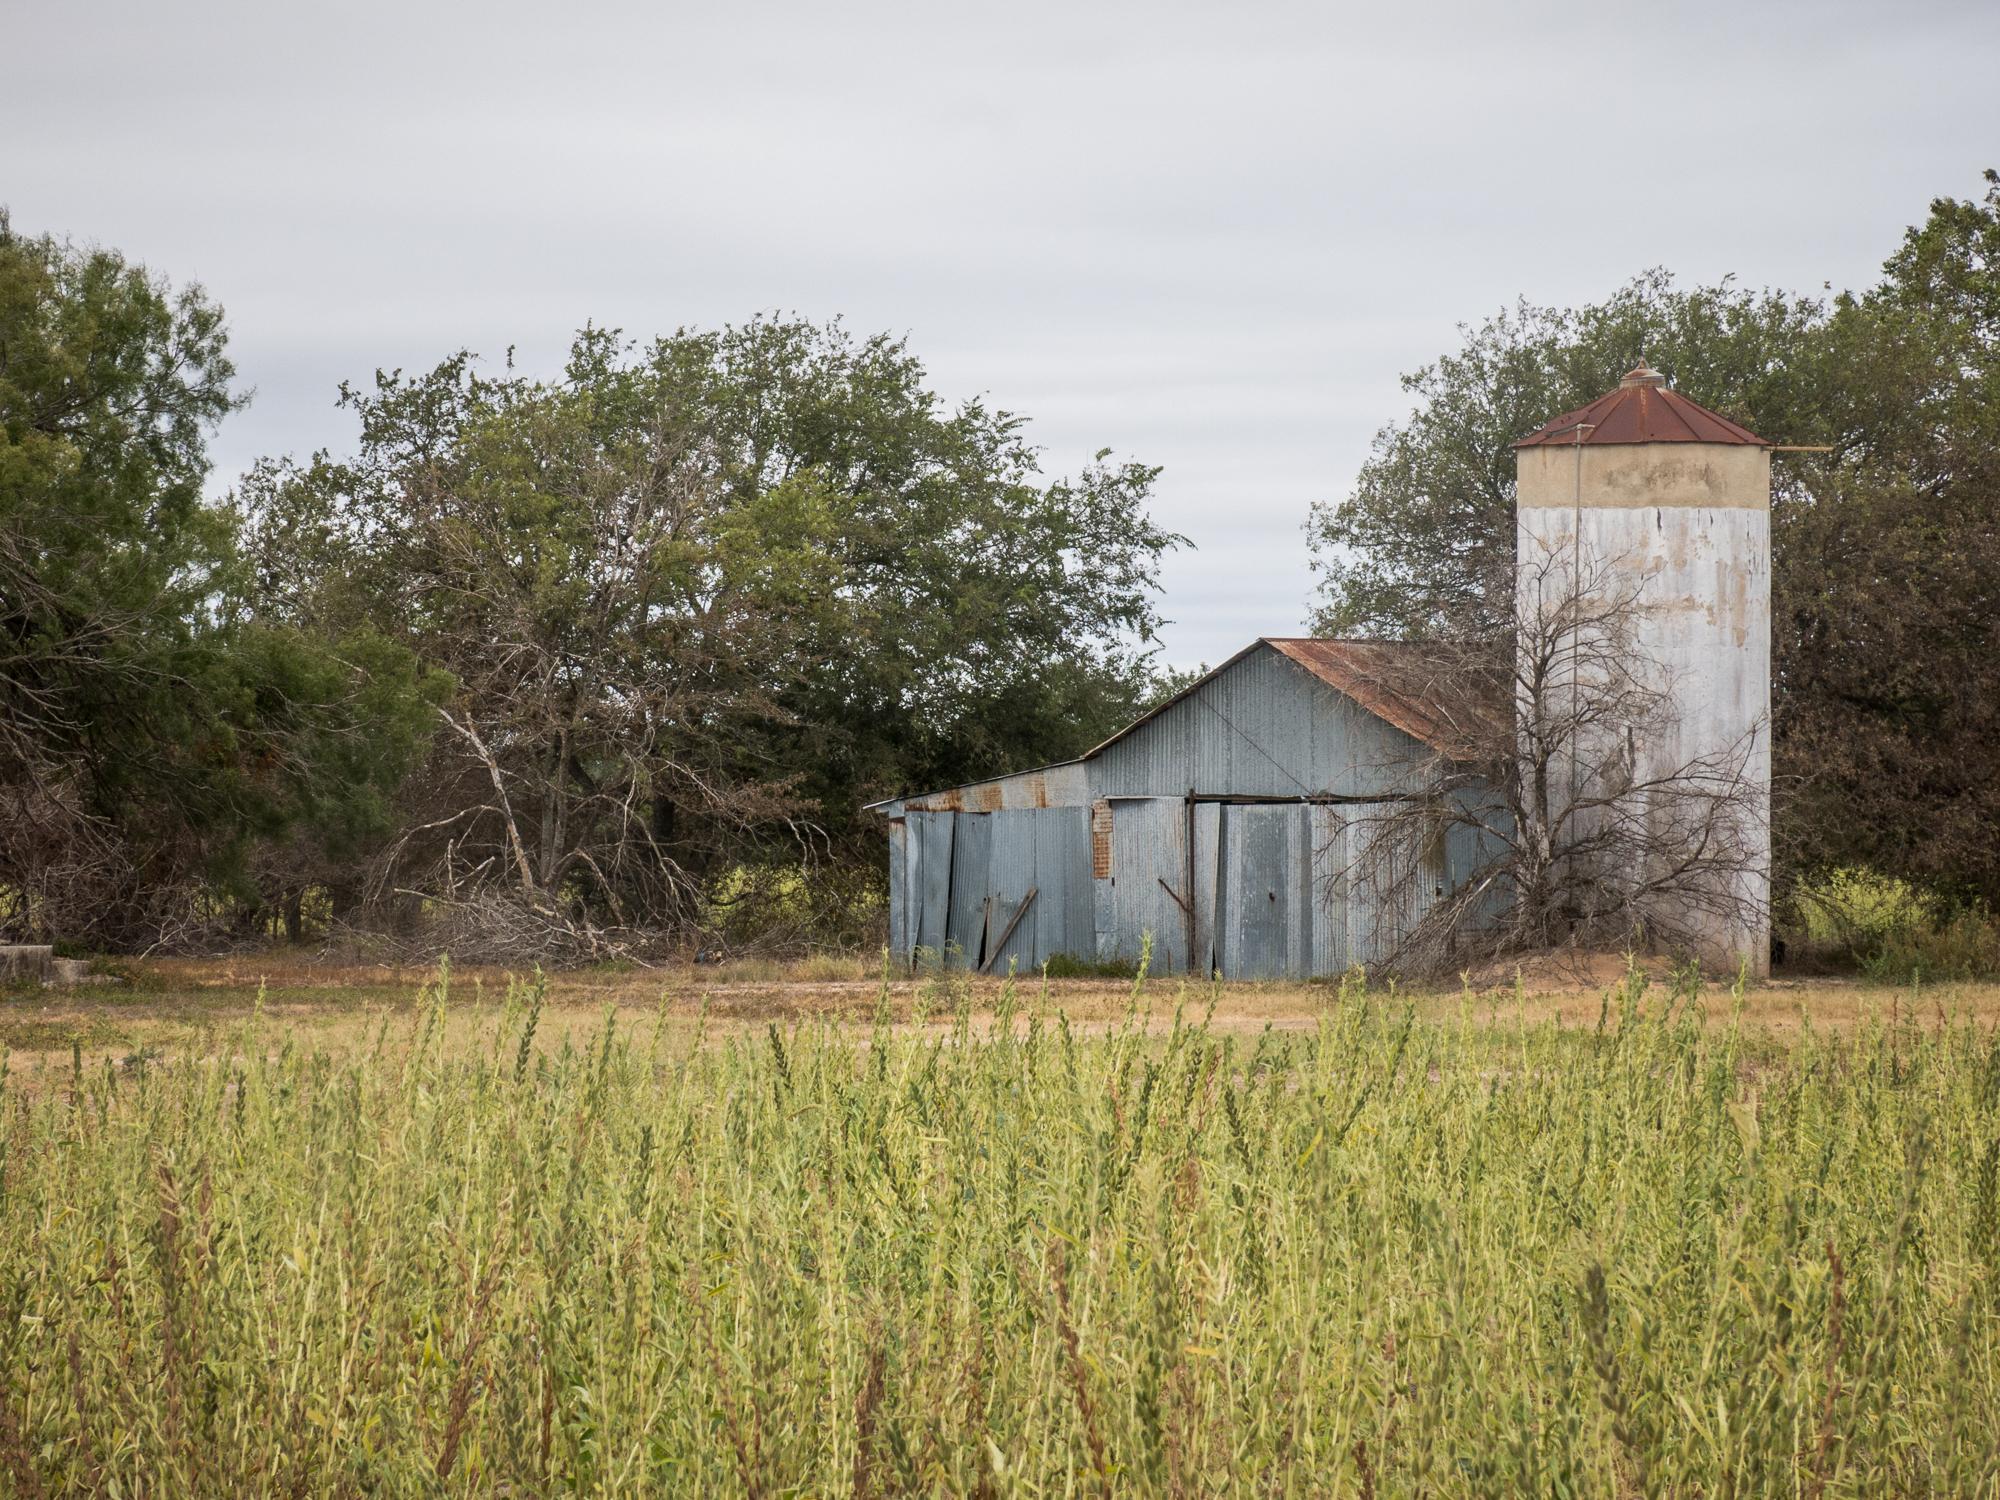 Sesame Field